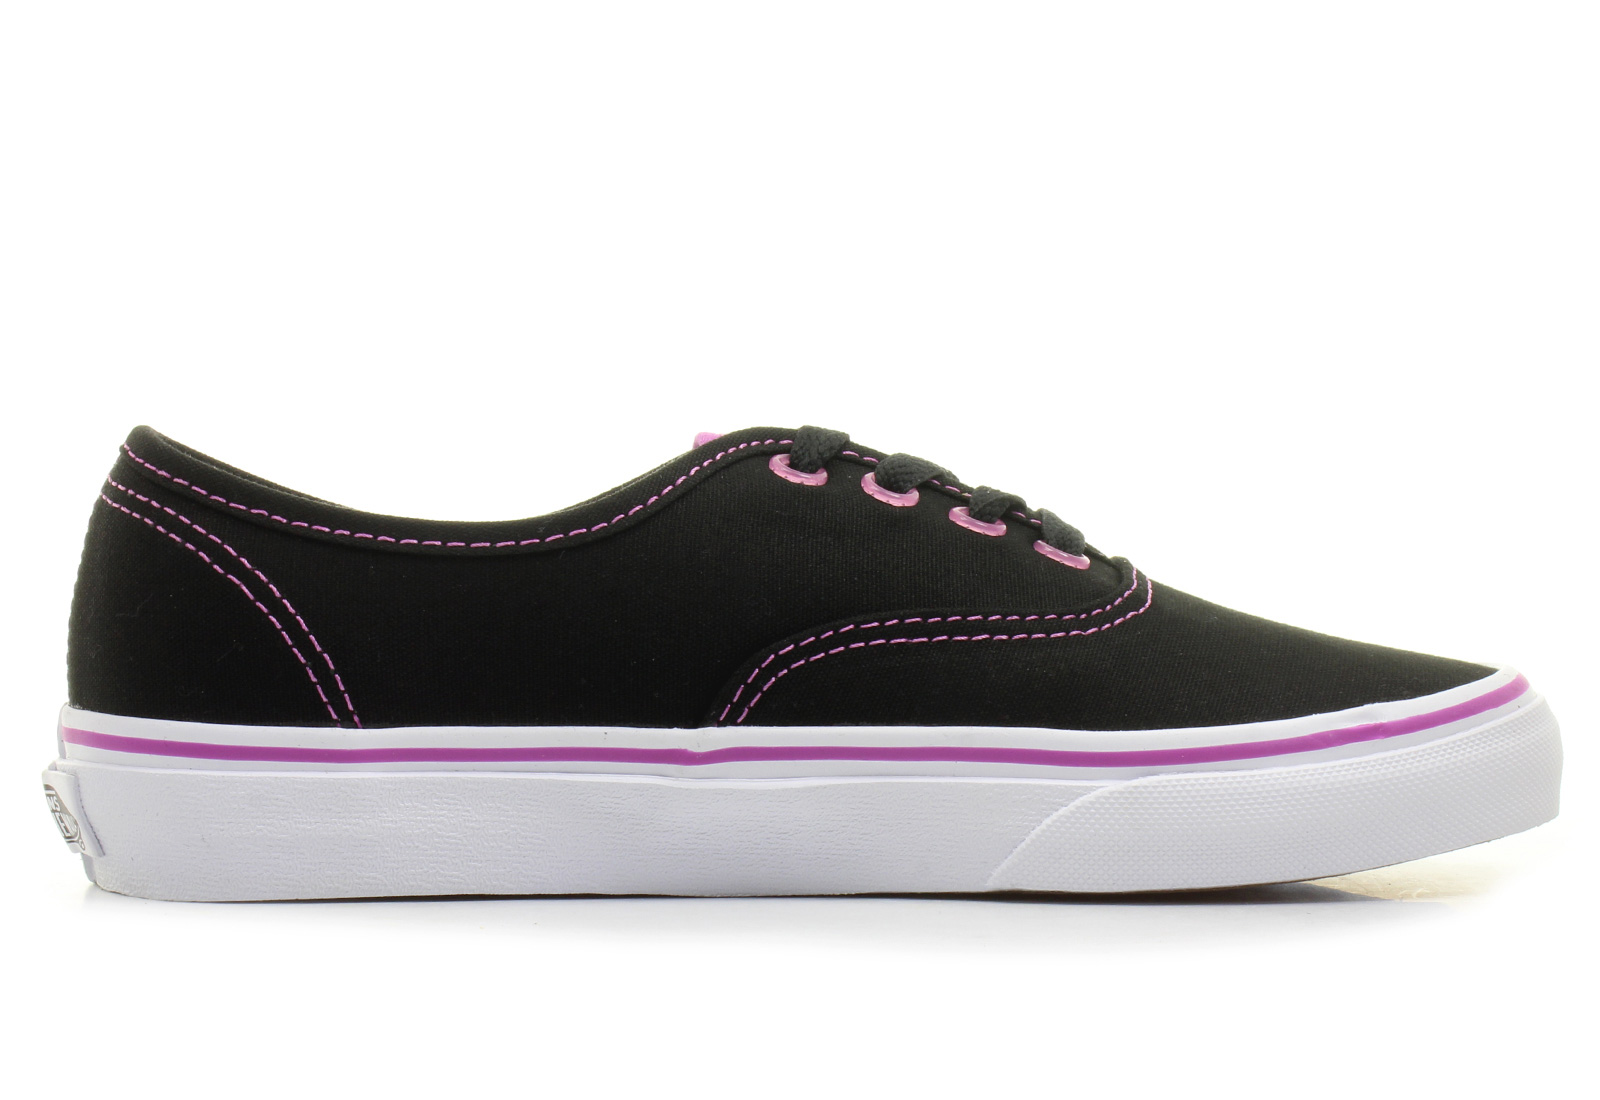 Vans Tornacipő - Authentic - VZUKFC6 - Office Shoes Magyarország 3c567aff7c